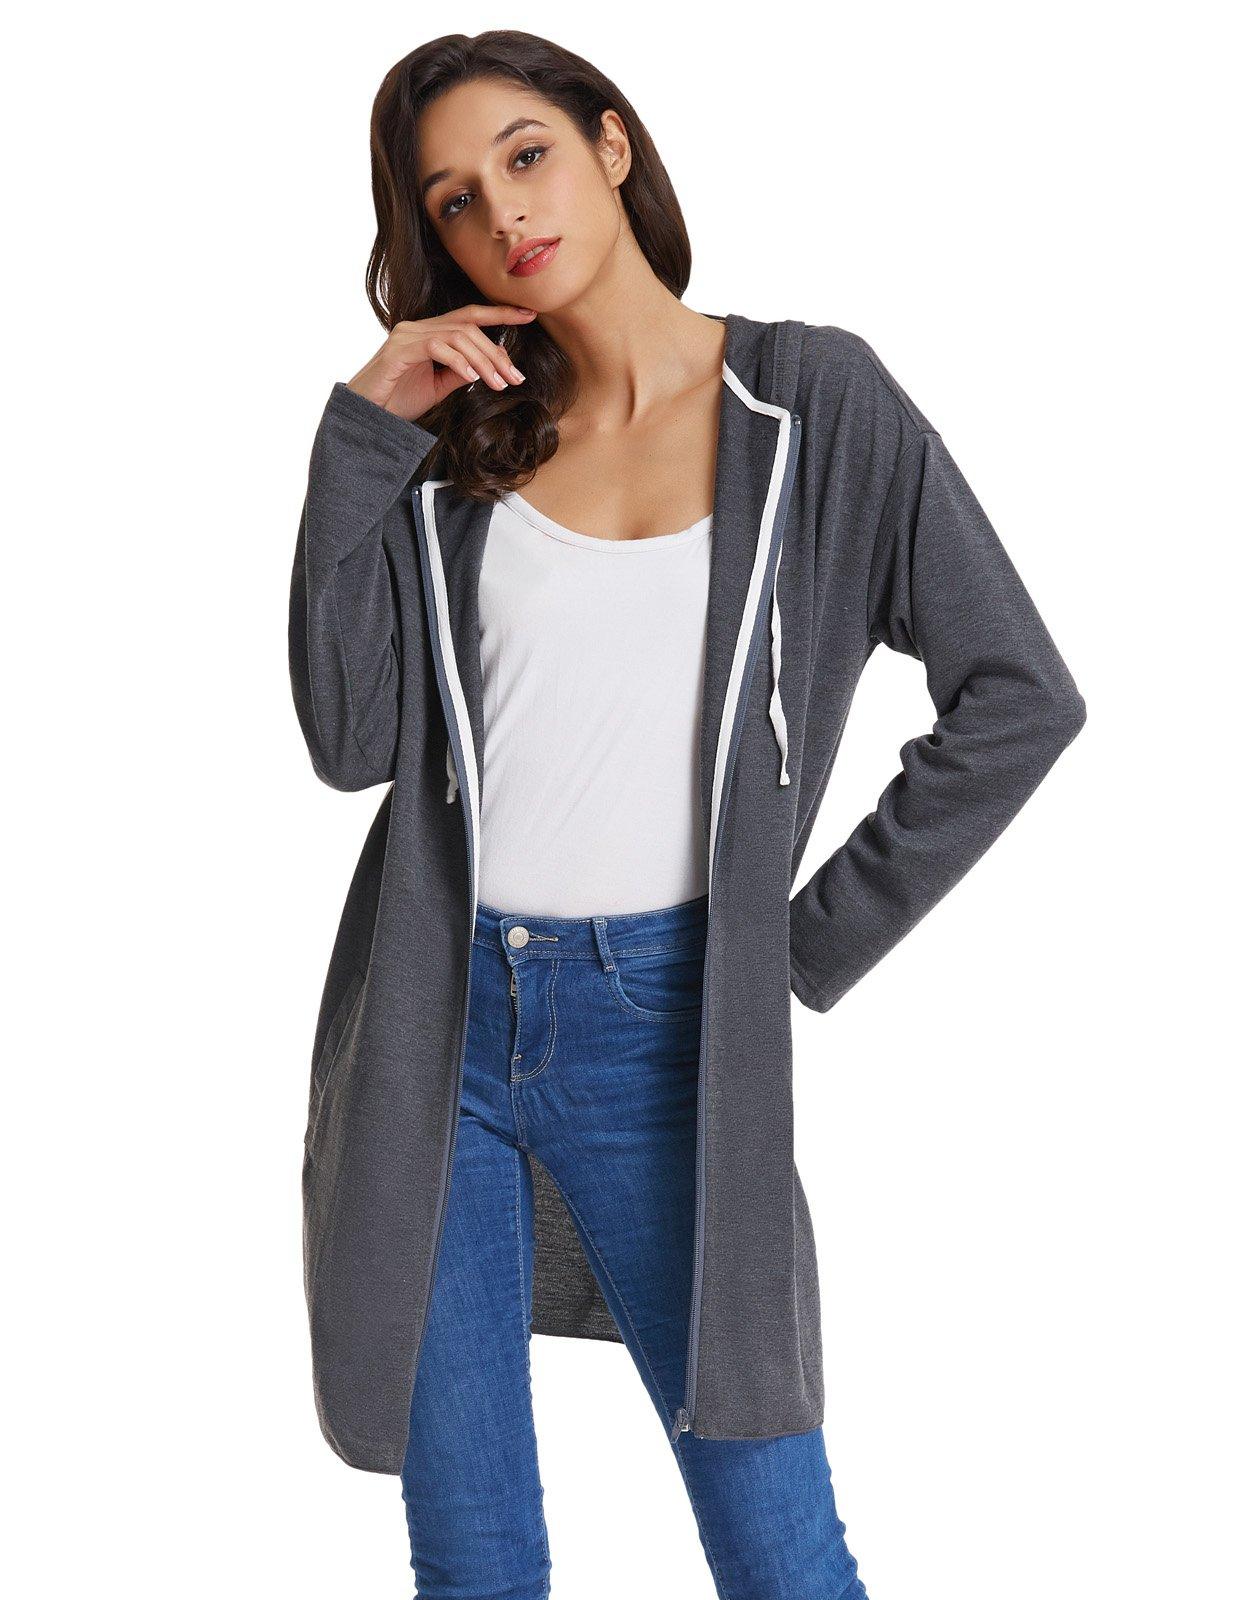 GRACE KARIN Basic Lightweight Jersey Hooded Sweatshirt for Women (M,Dark Grey)